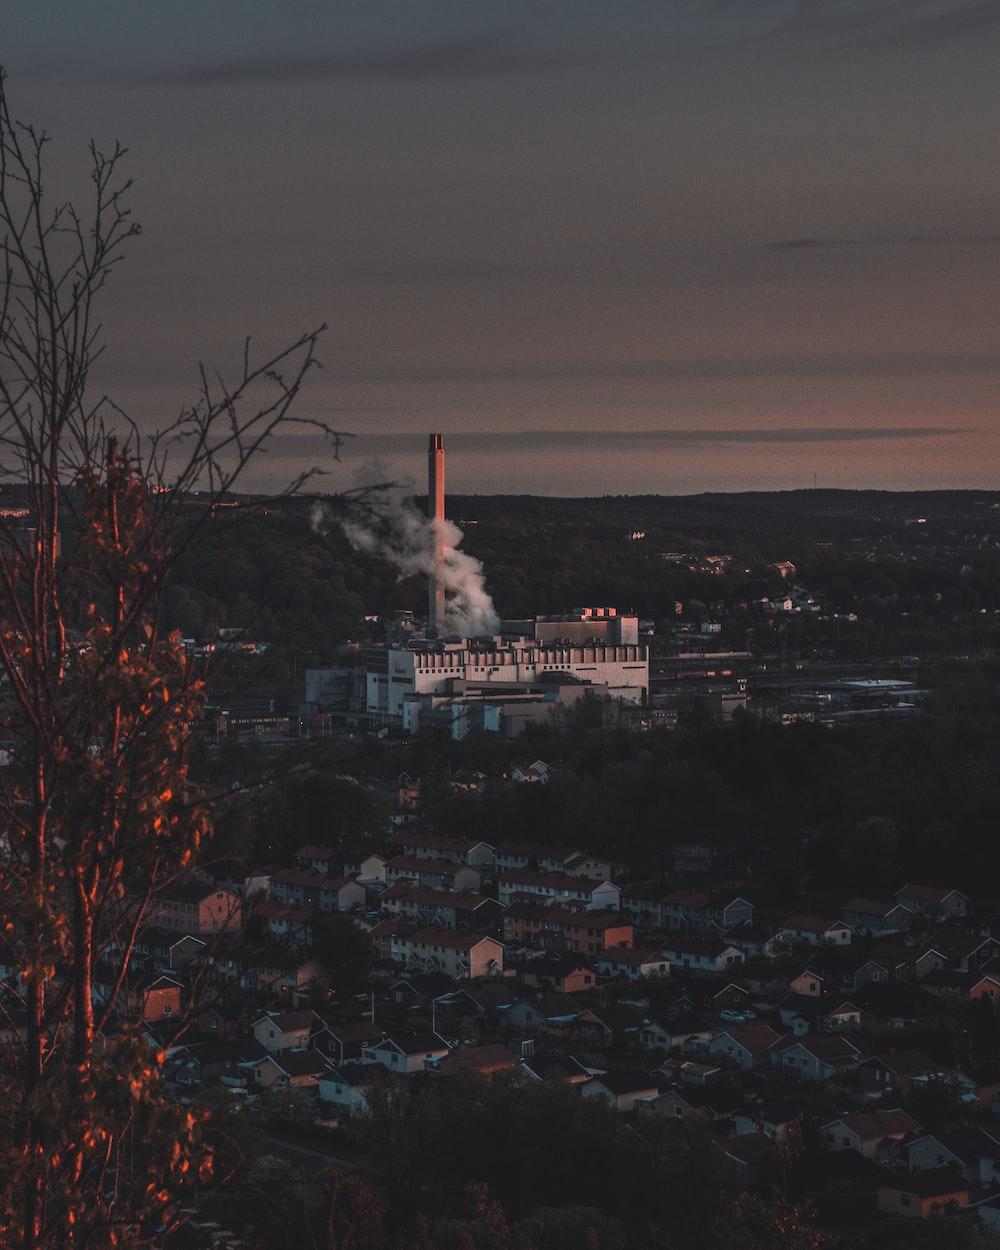 white factory releasing white smoke